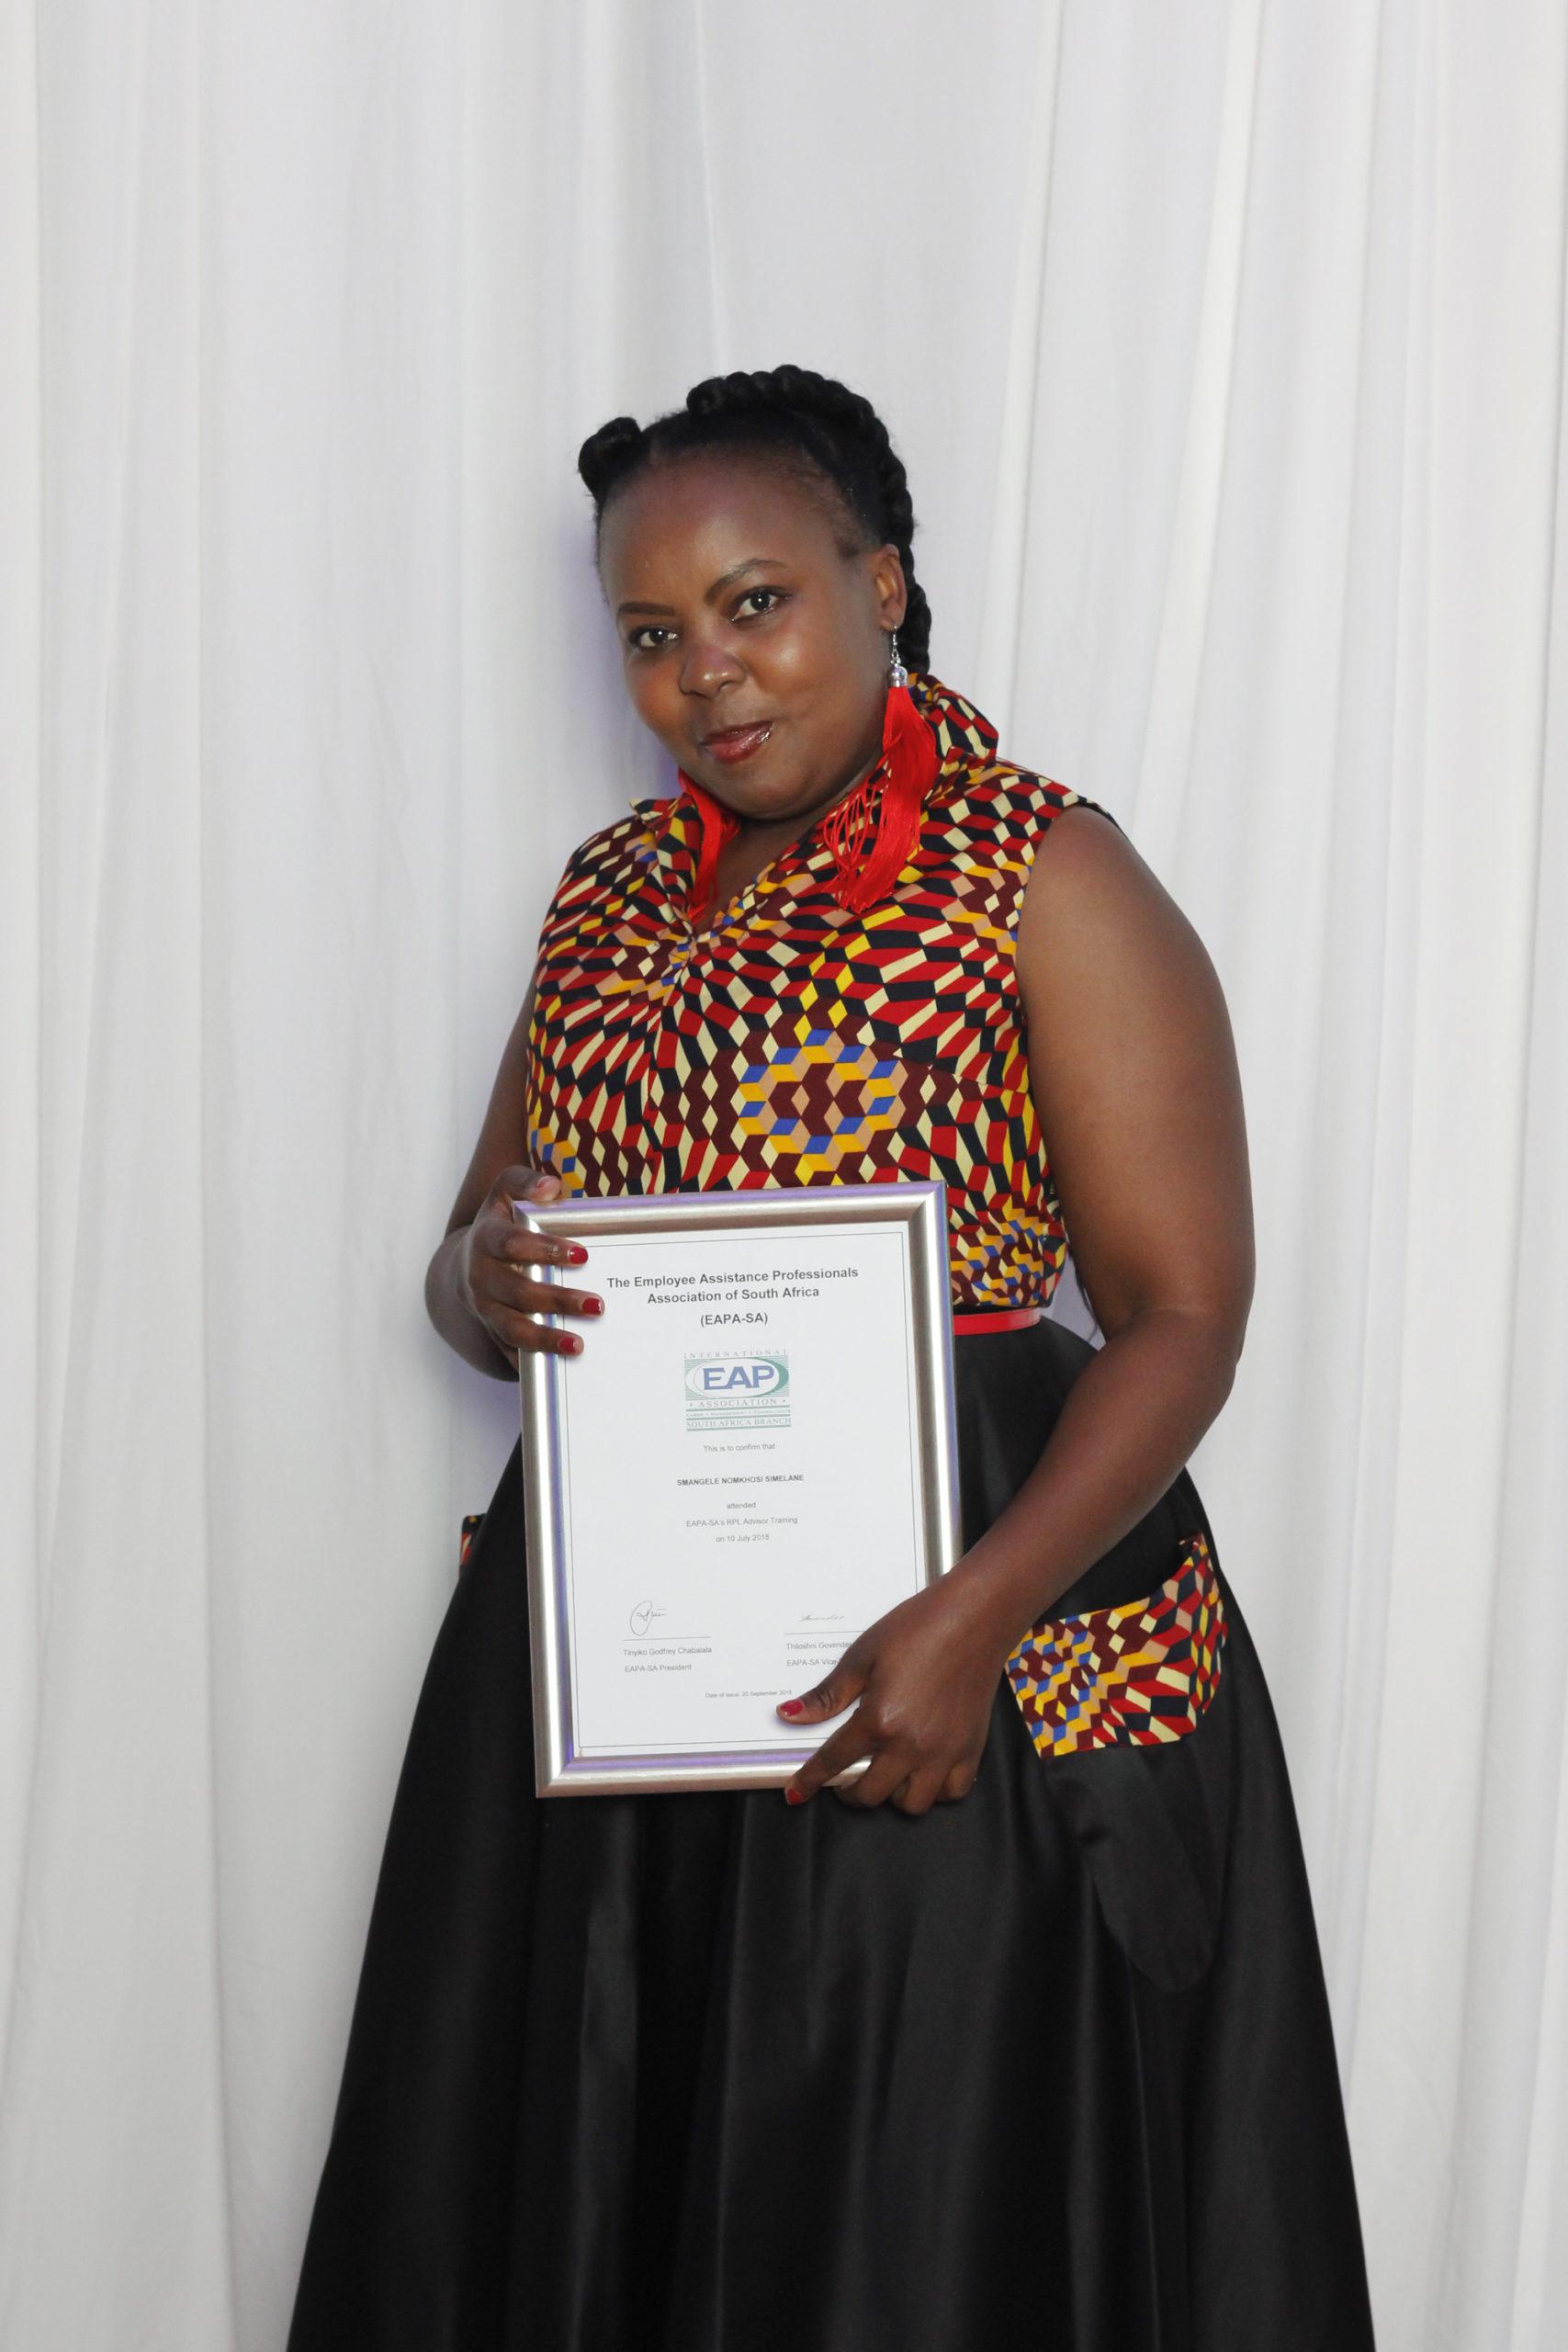 KwaZulu Natal Chapter